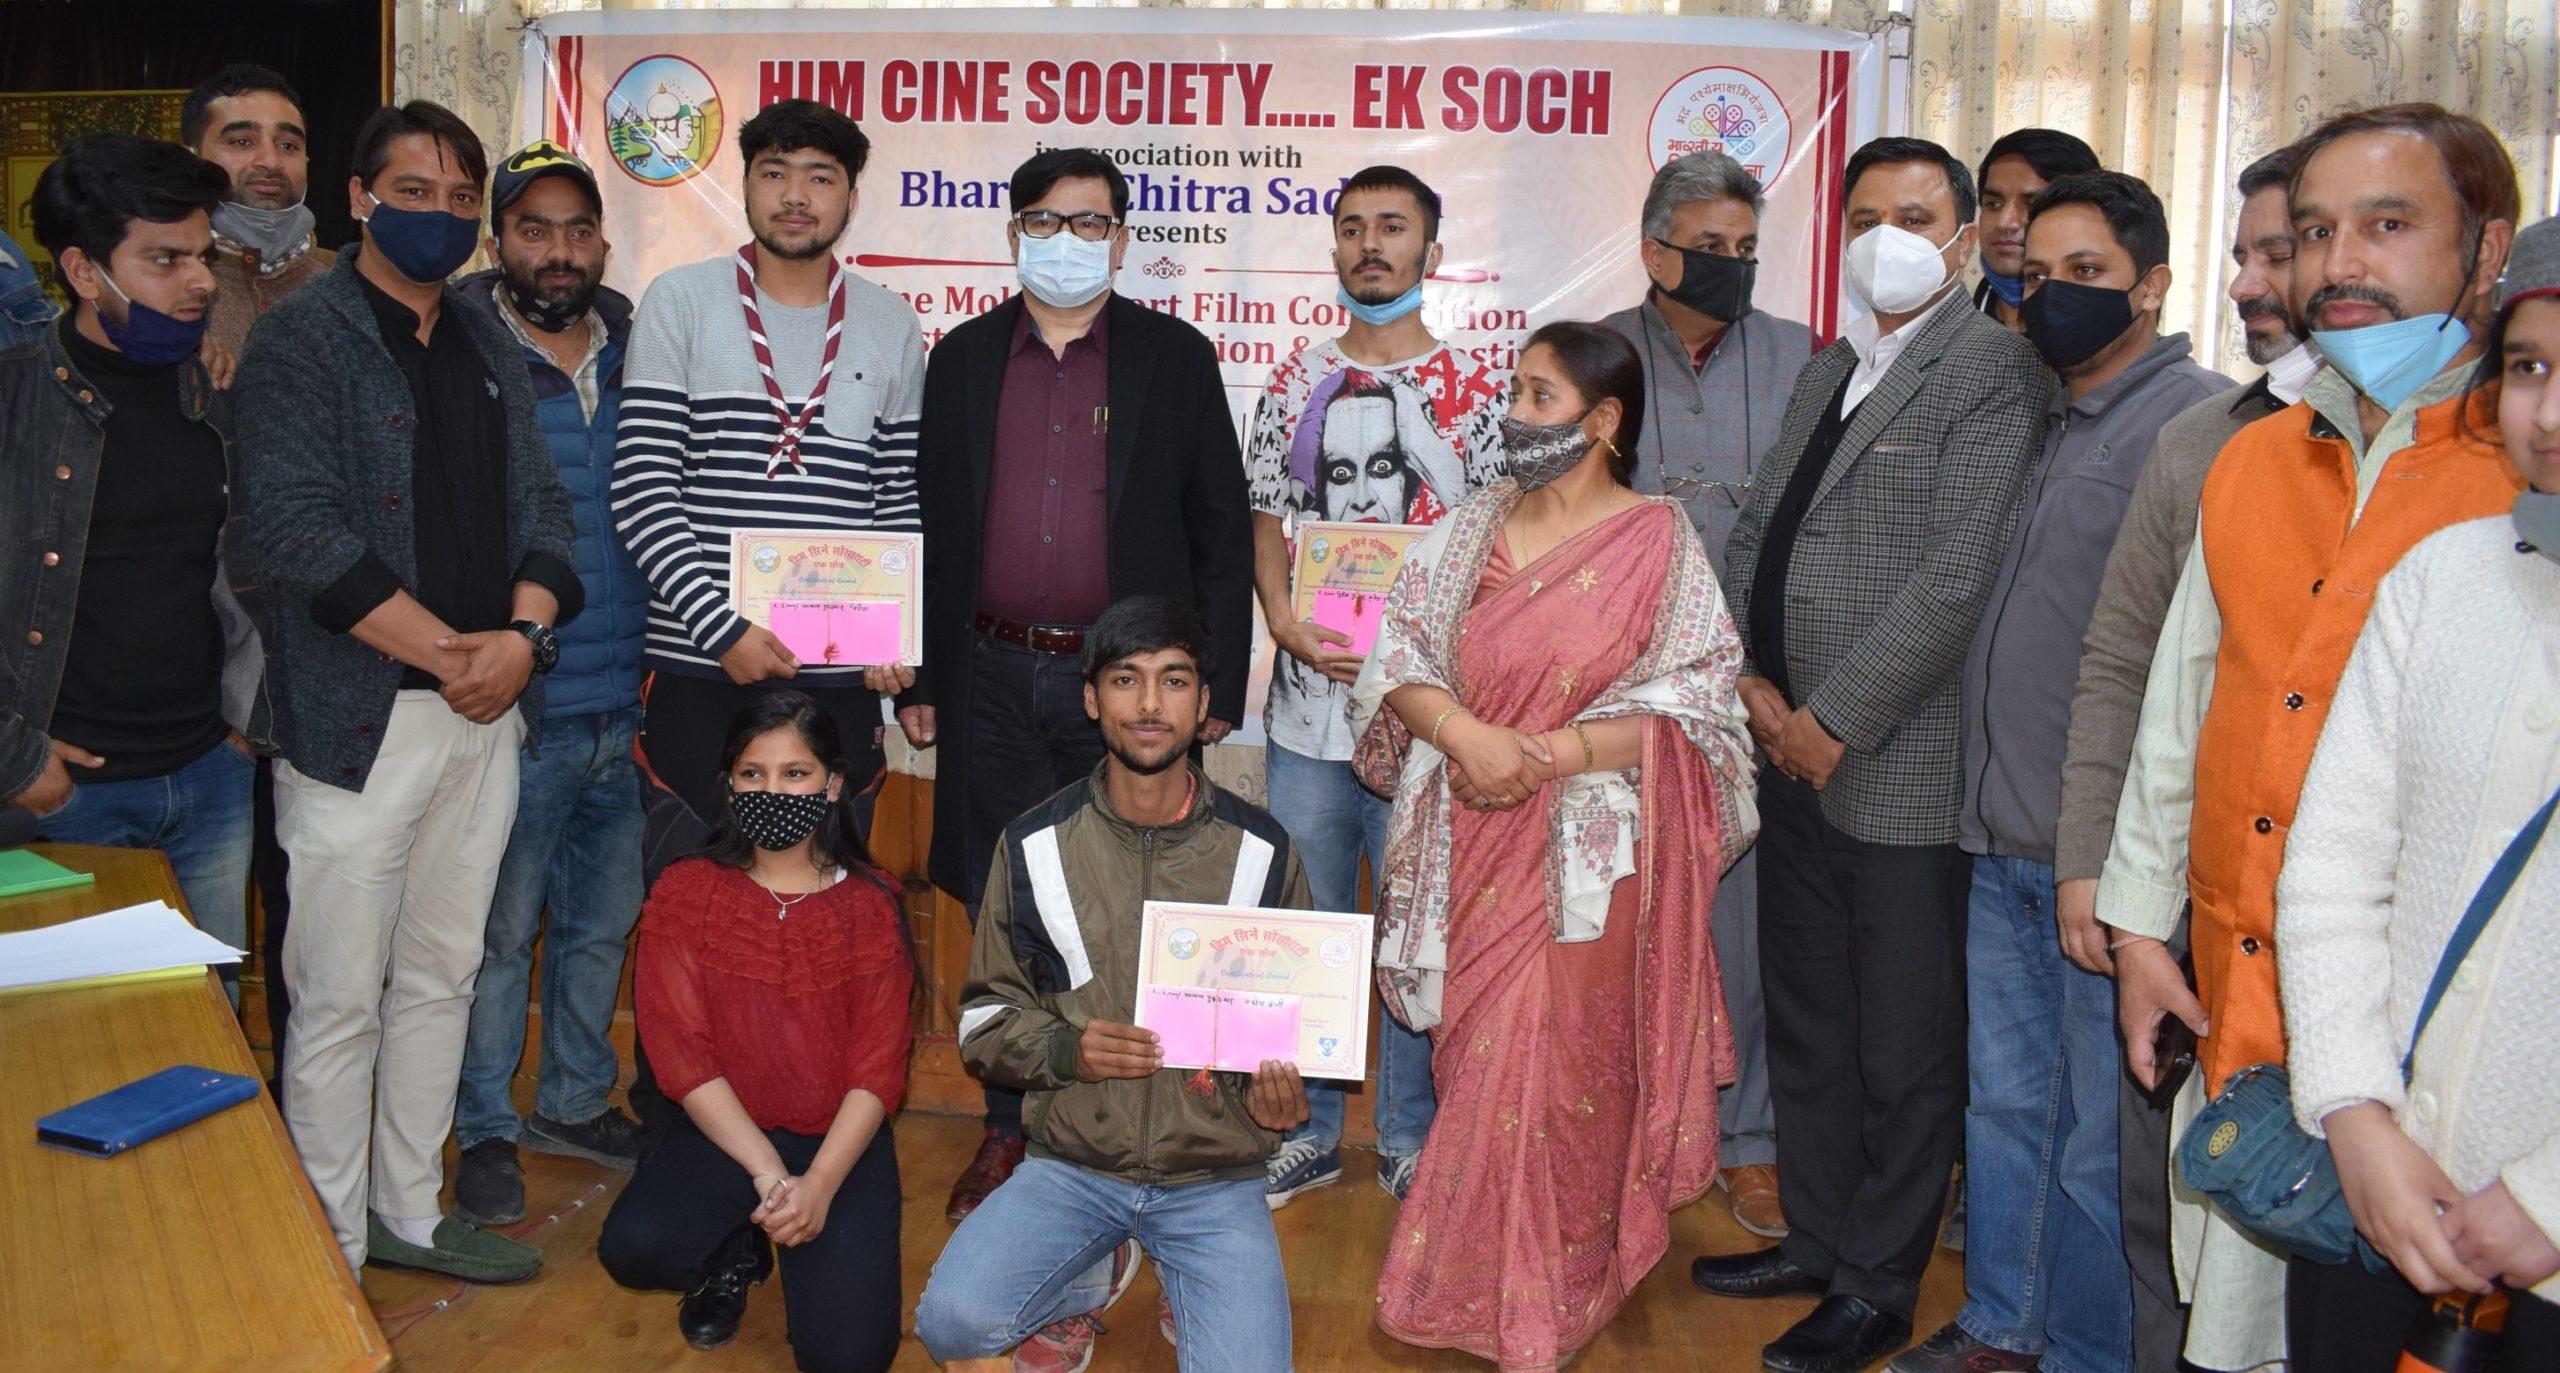 शिक्षा मंत्री ने नवाजे ऑन लाईन मोबाइल शाॅट फिल्म निर्माण प्रतियोगिता के विजेता